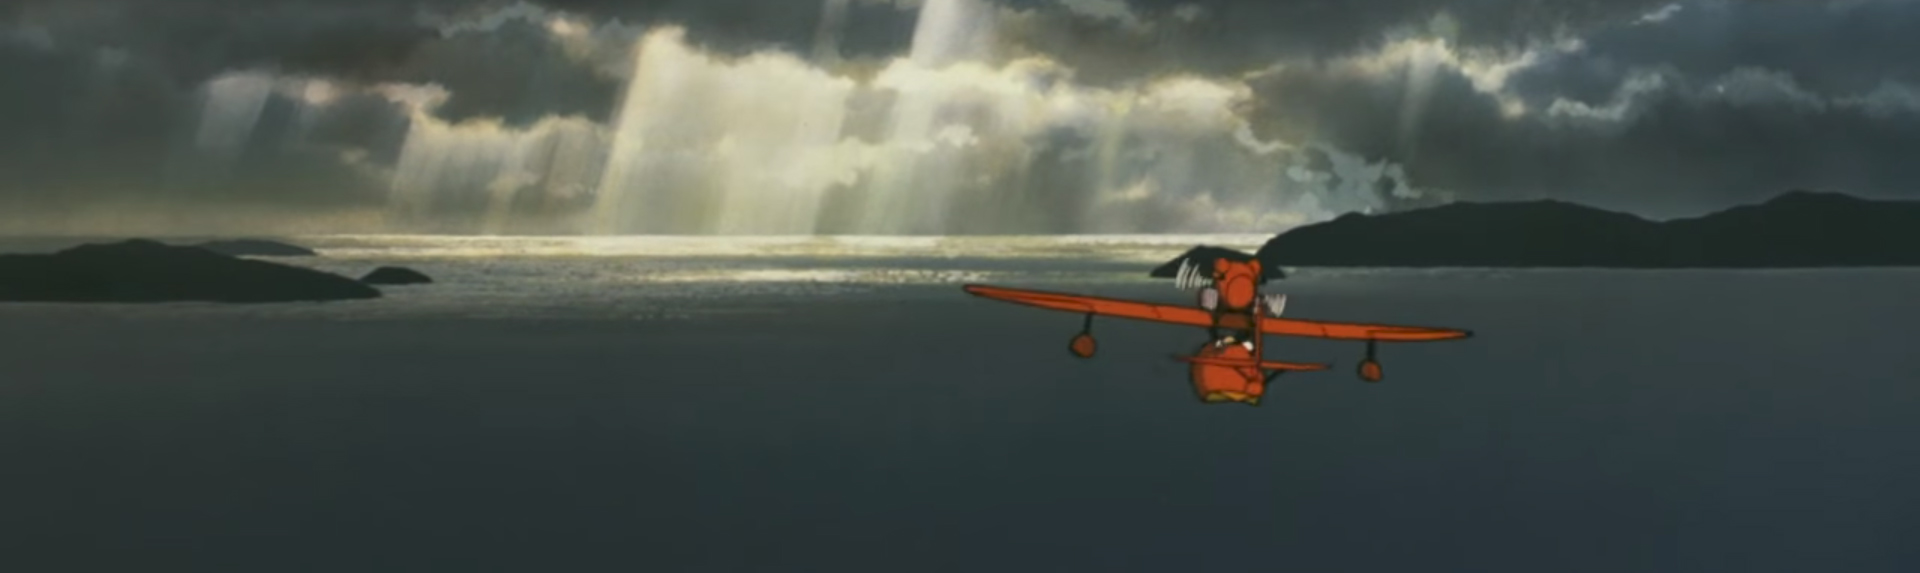 Porco Rosso (紅の豚). Image Credit: Studio Ghibli.